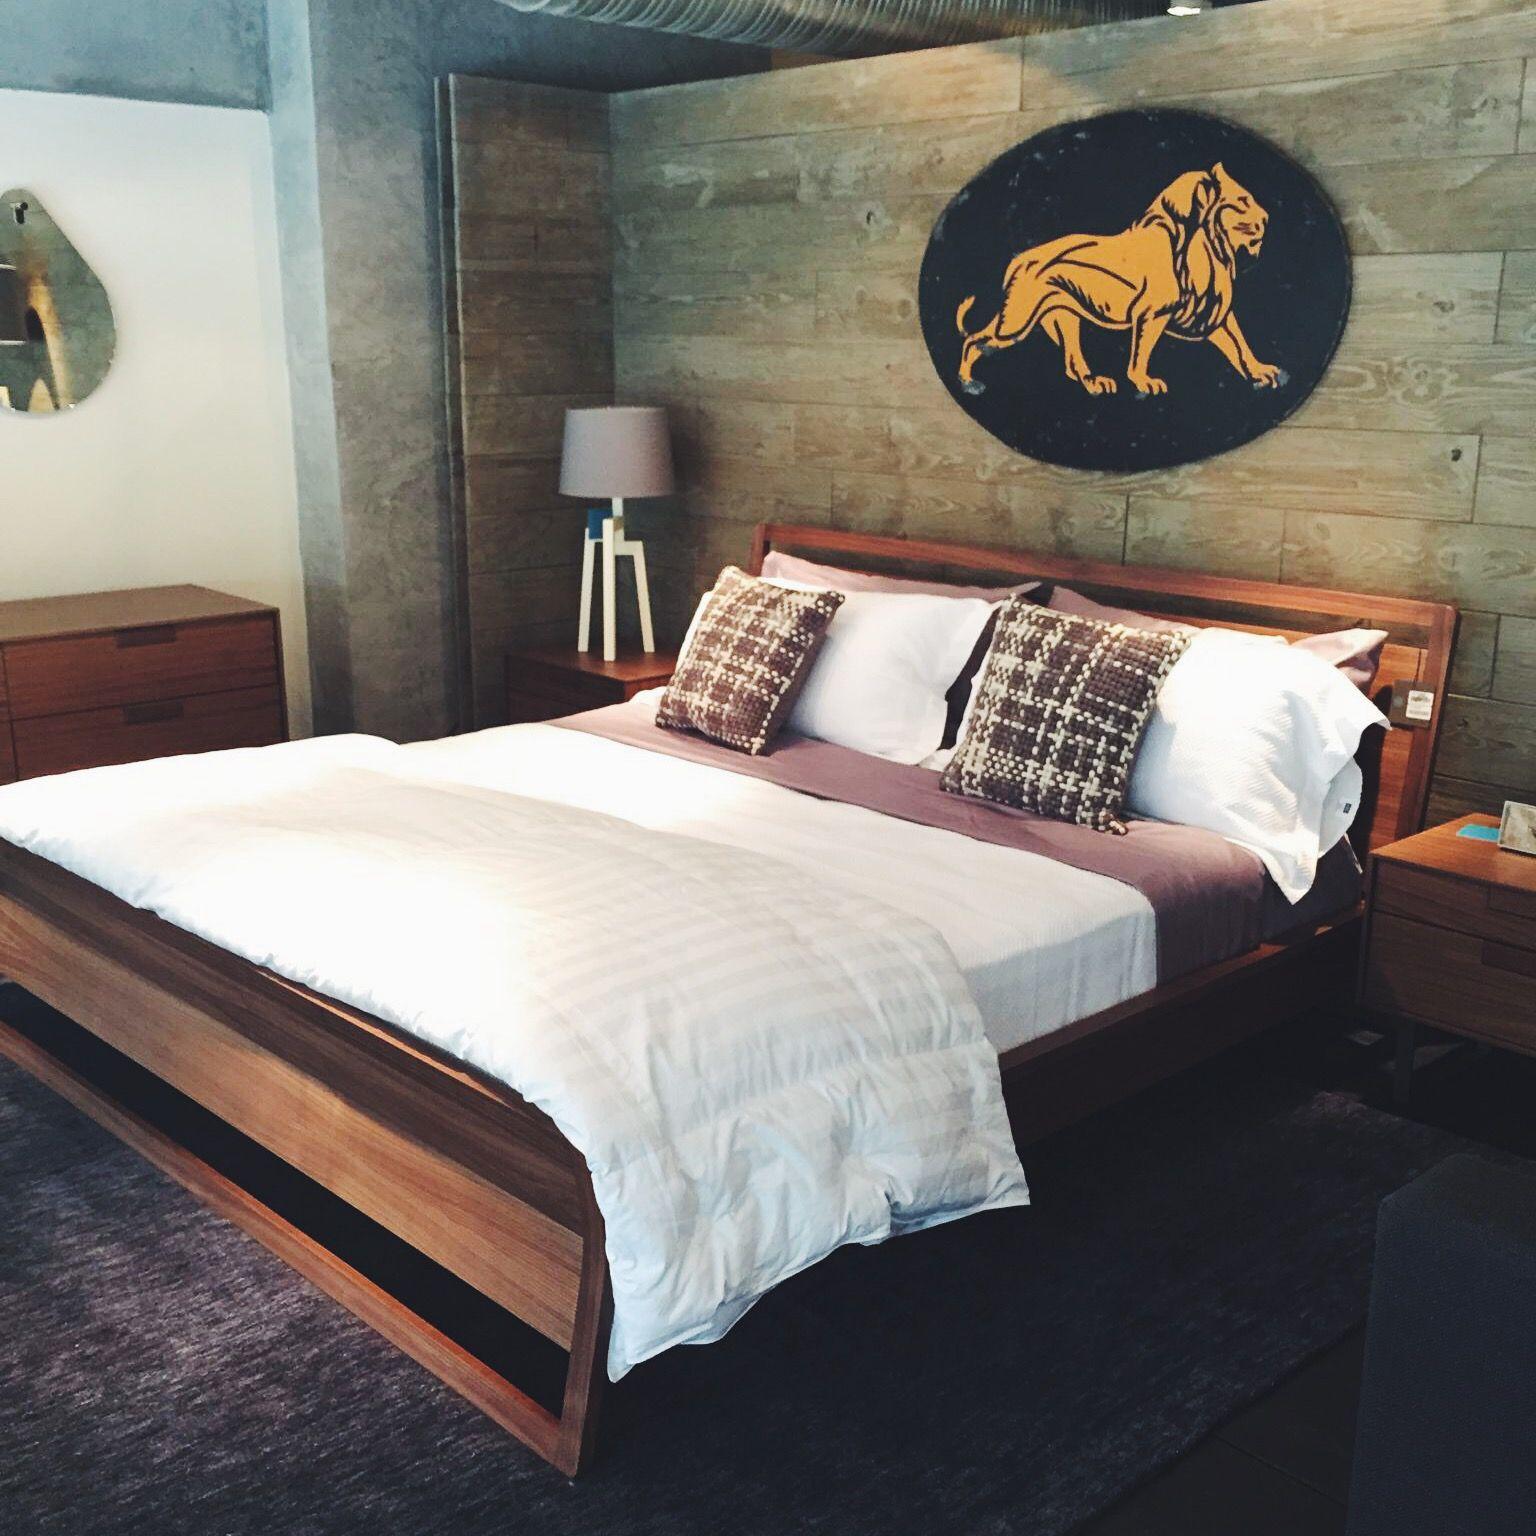 444f4078d Morning Wood. Blu Dot Woodrow Bed, Bubbie Pillow and Stilt Lamp.  #modernbedroom #modernfurniture #modernbeds